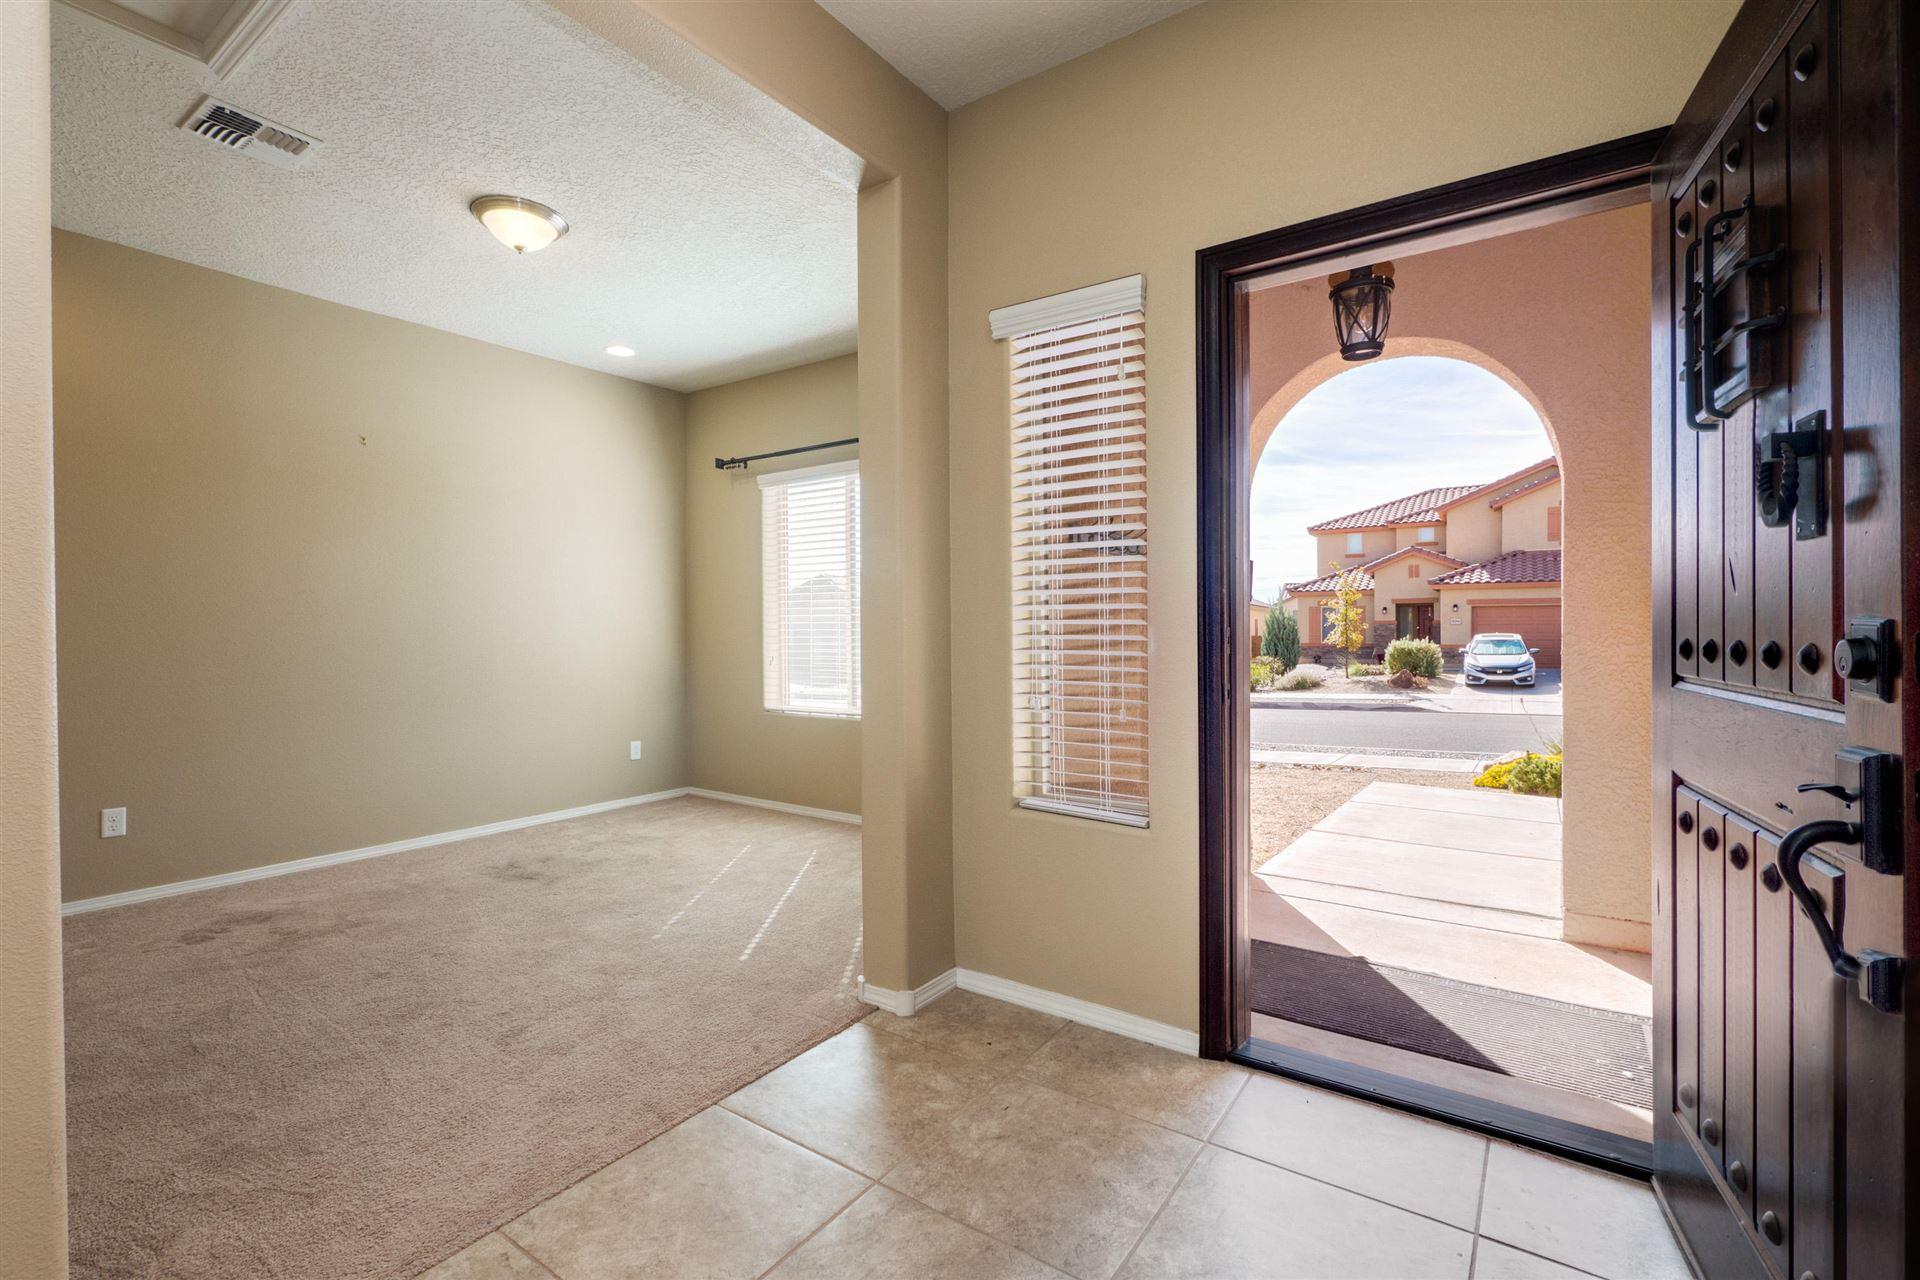 Photo of 3821 Puenta Alto Drive NE, Rio Rancho, NM 87124 (MLS # 979915)